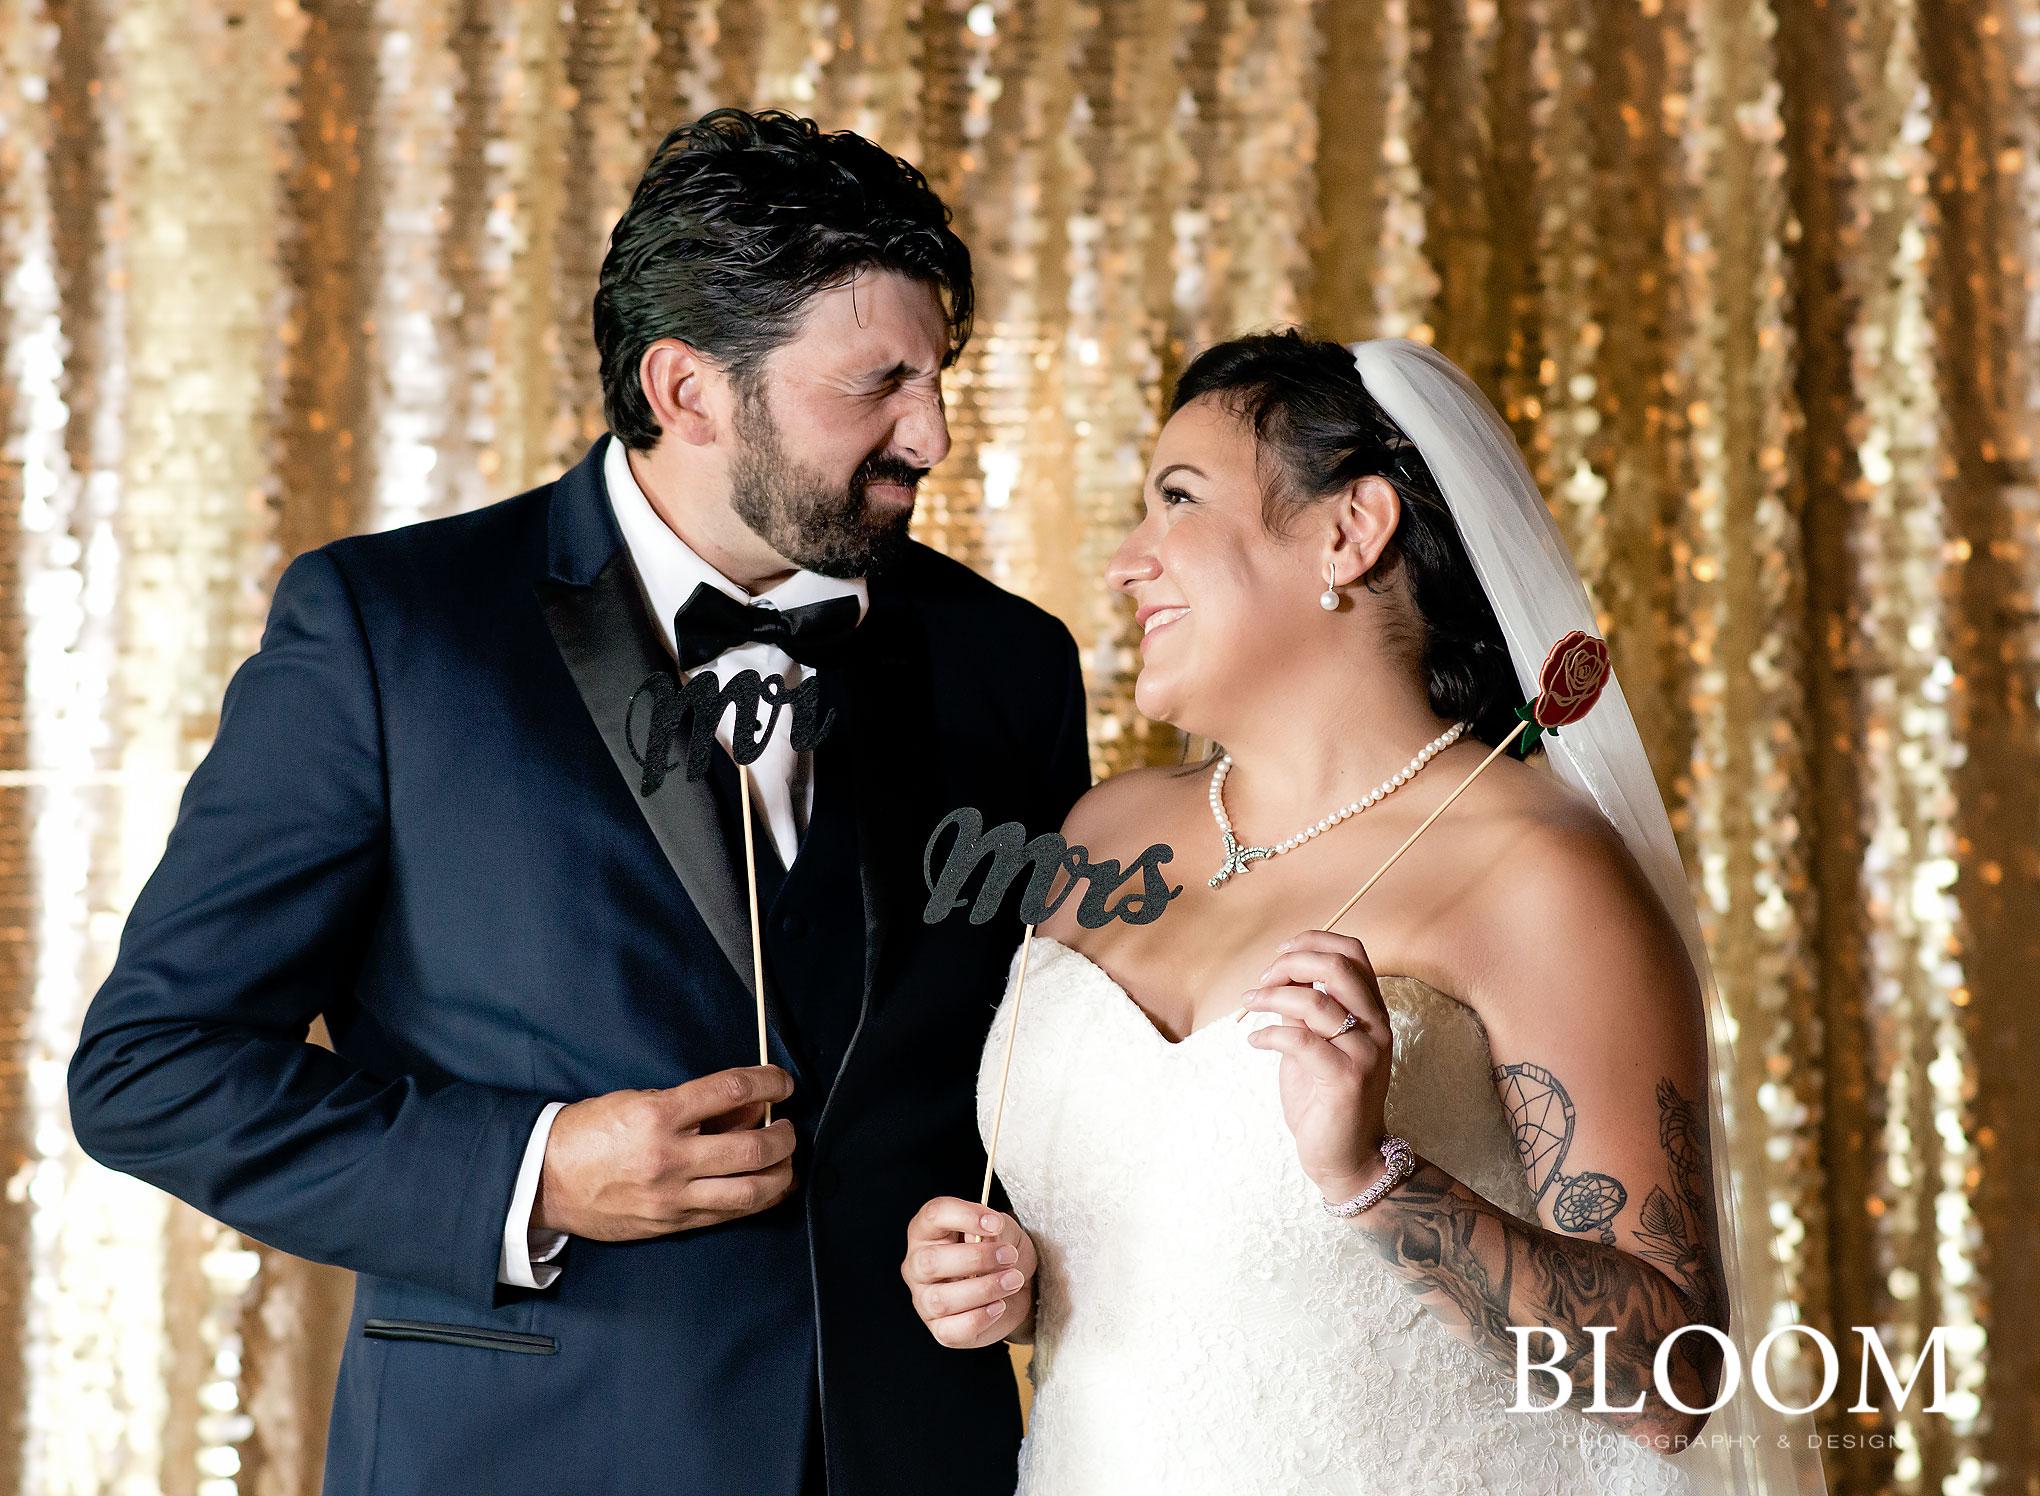 Wedding_photography_san_antonio_texas_bloom_NMM_6102.jpg